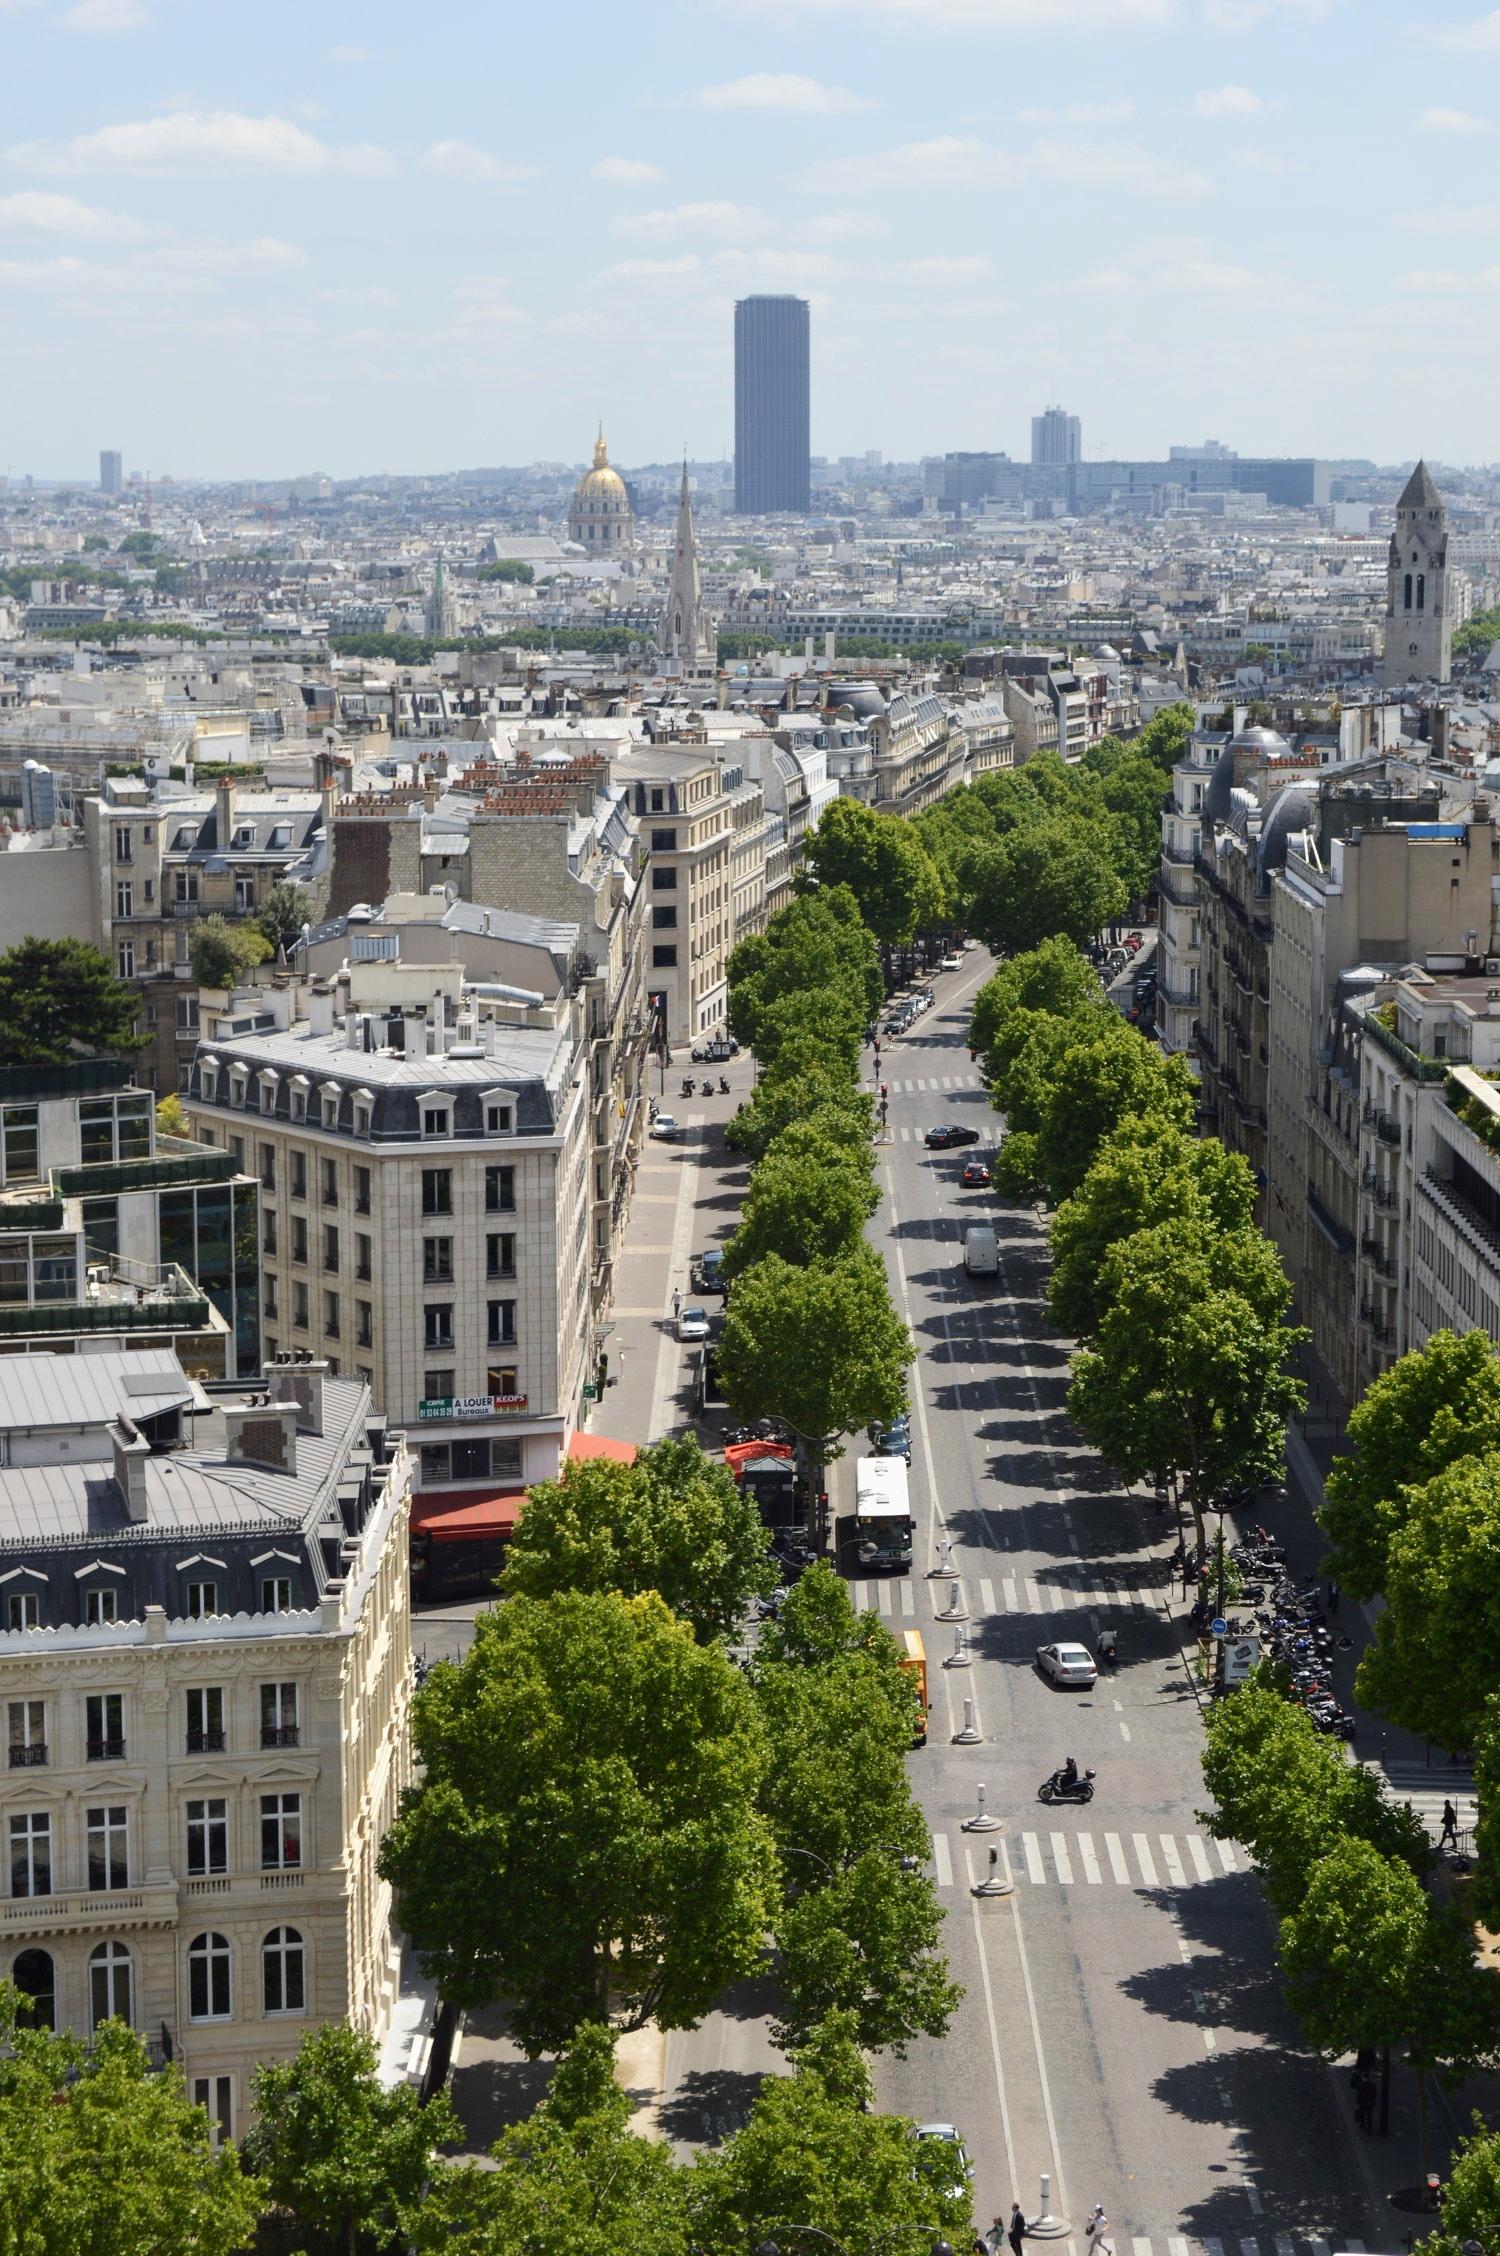 Paris, France - my first solo trip - June 2014